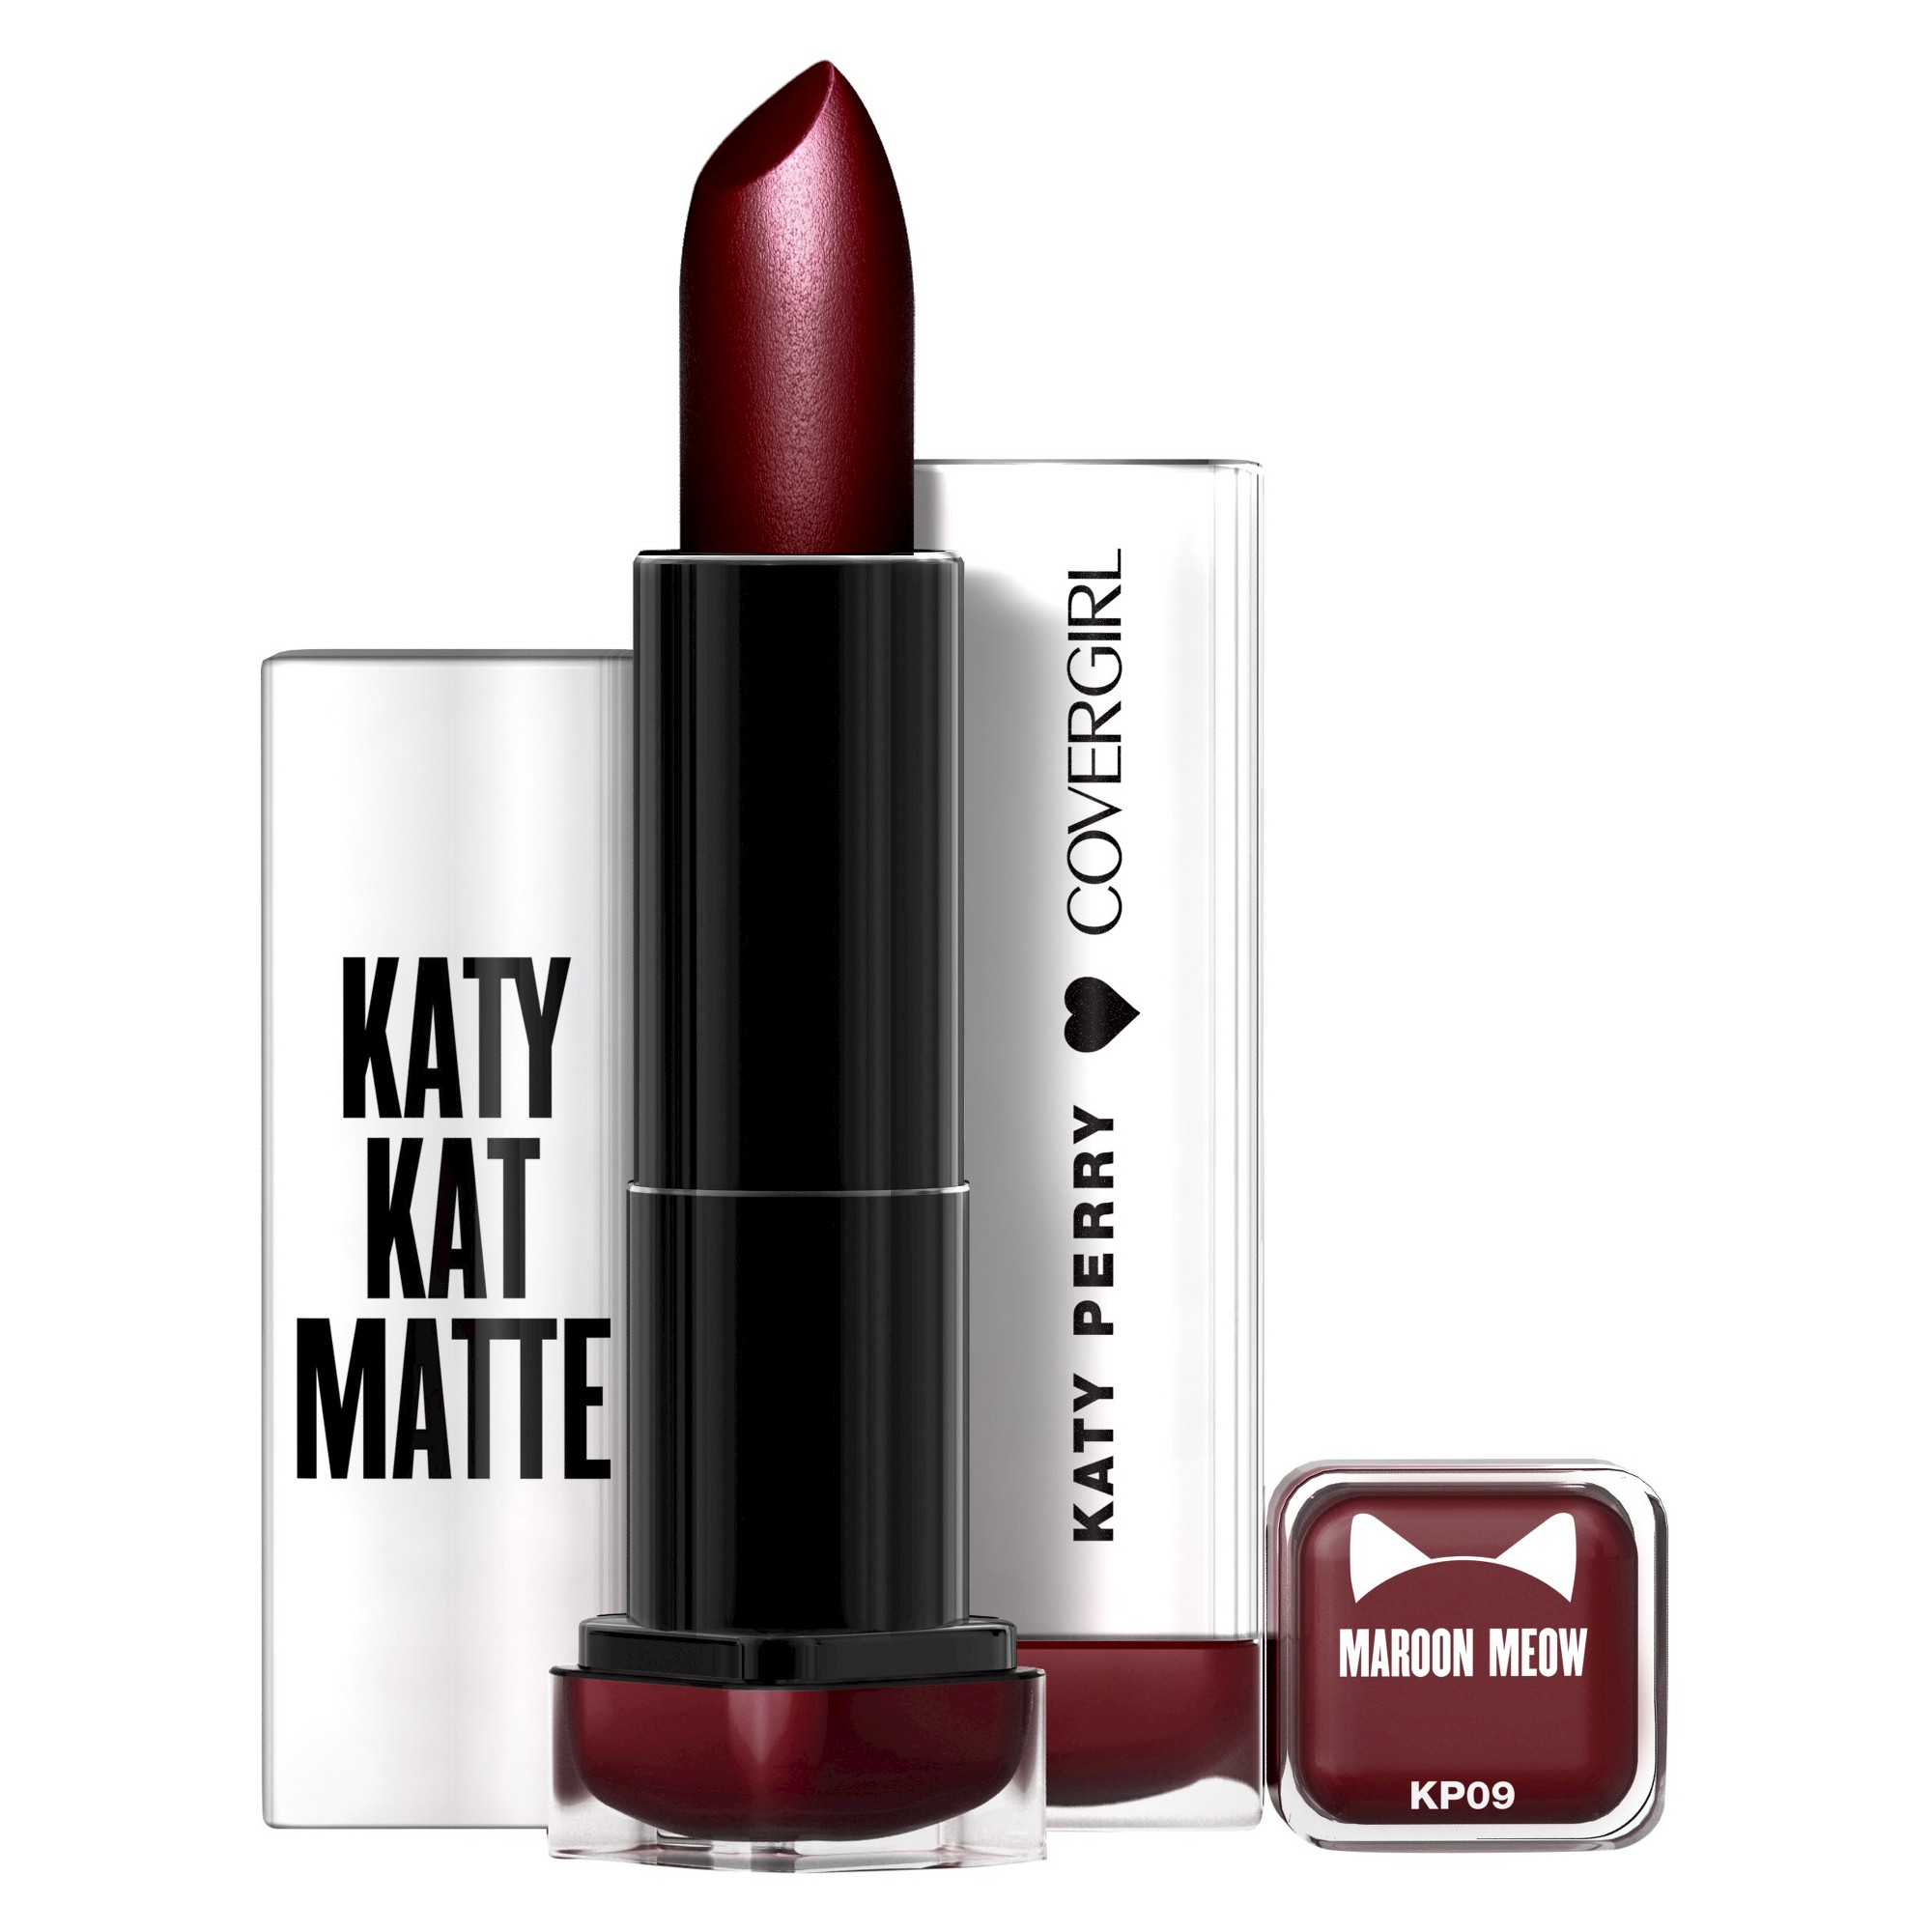 Covergirl Katy Kat Matte Lipstick KP09 Maroon Meow .12oz